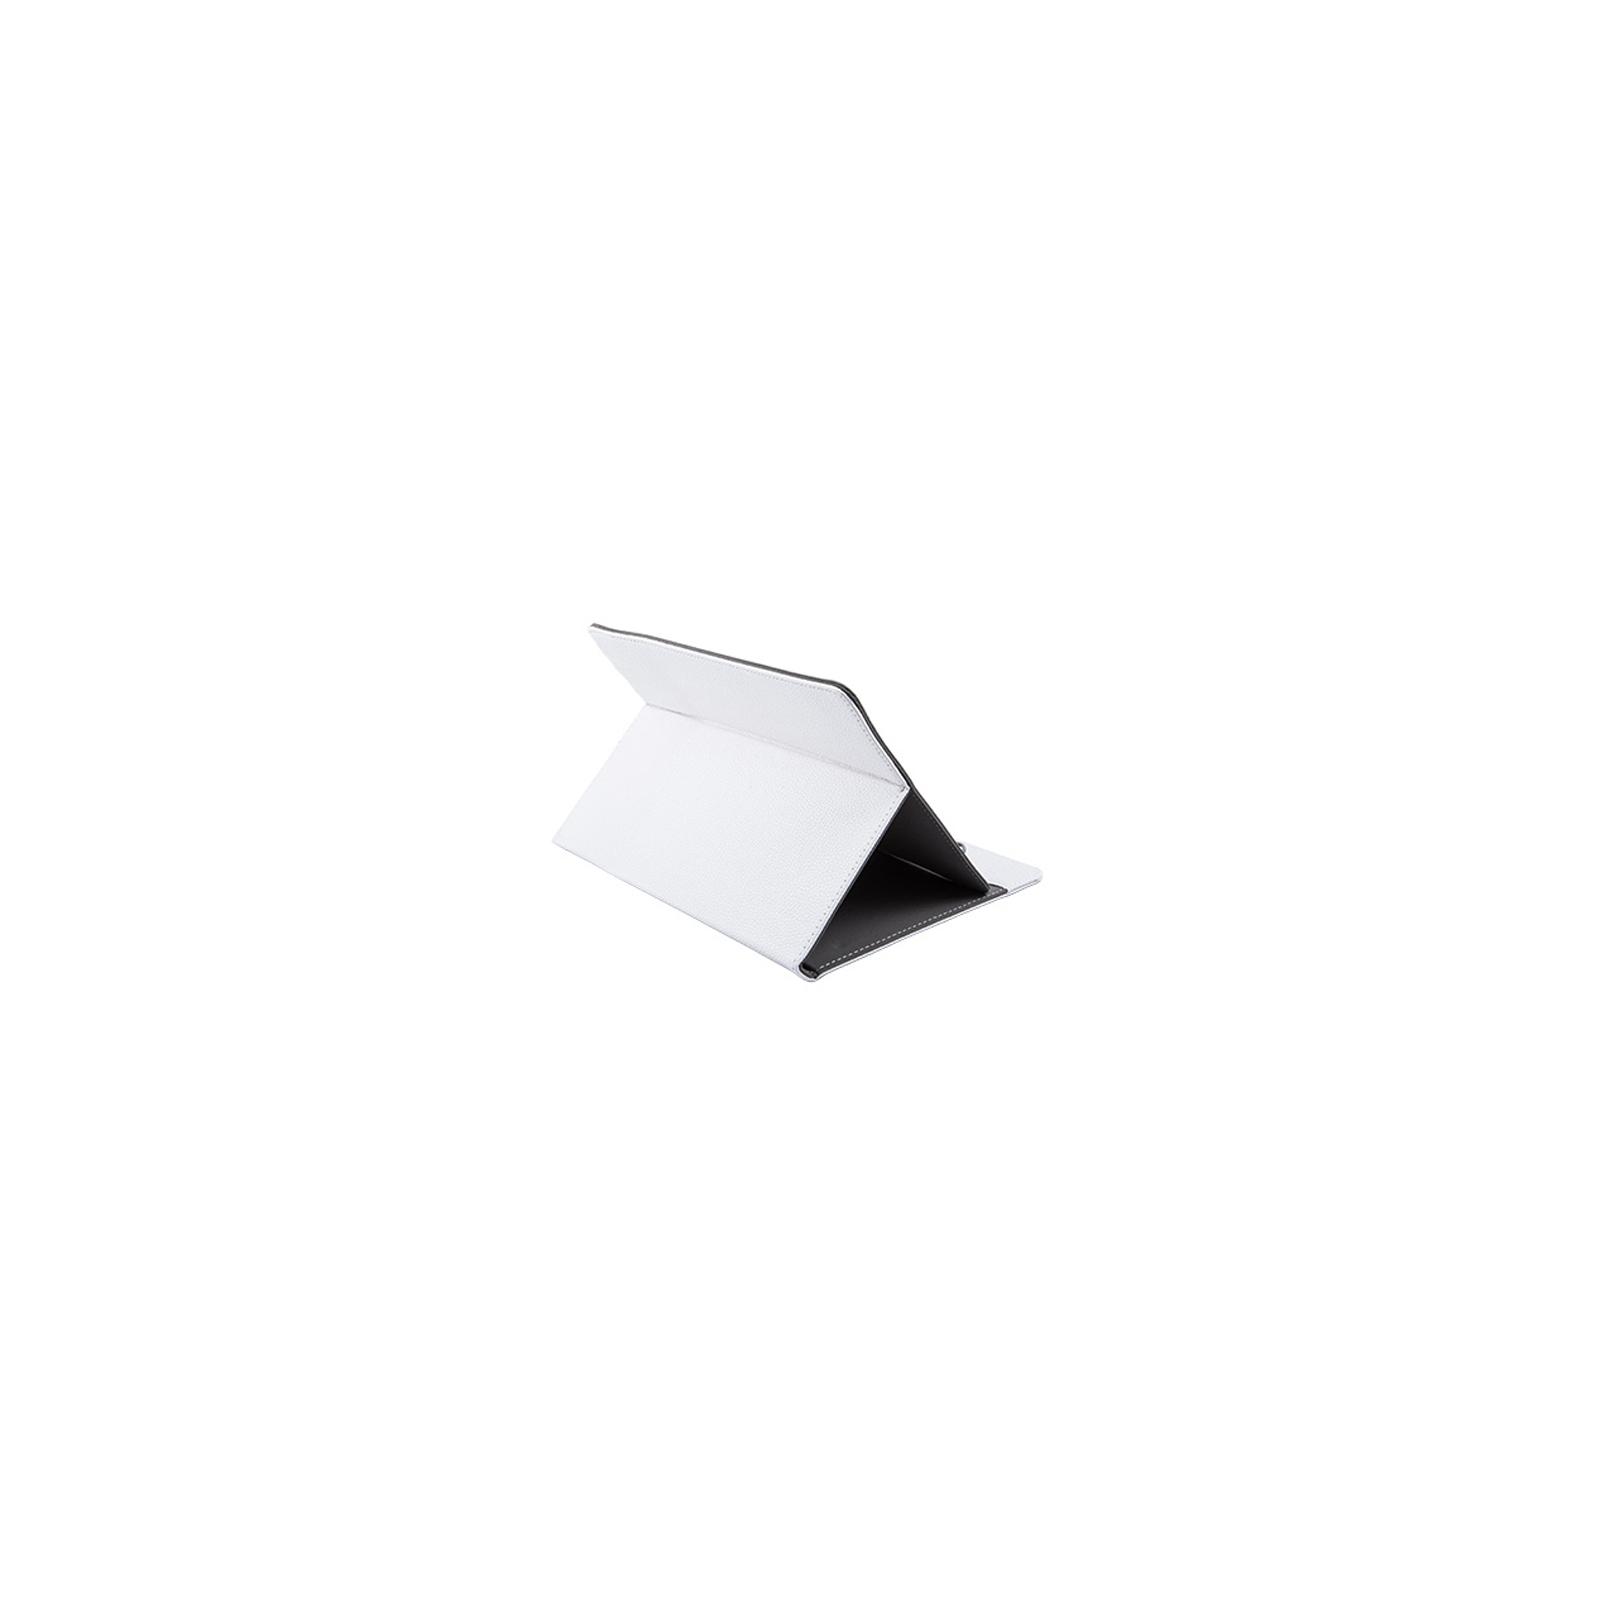 "Чехол для планшета Drobak 10""-10.1"" Universal Stand White (216882) изображение 3"